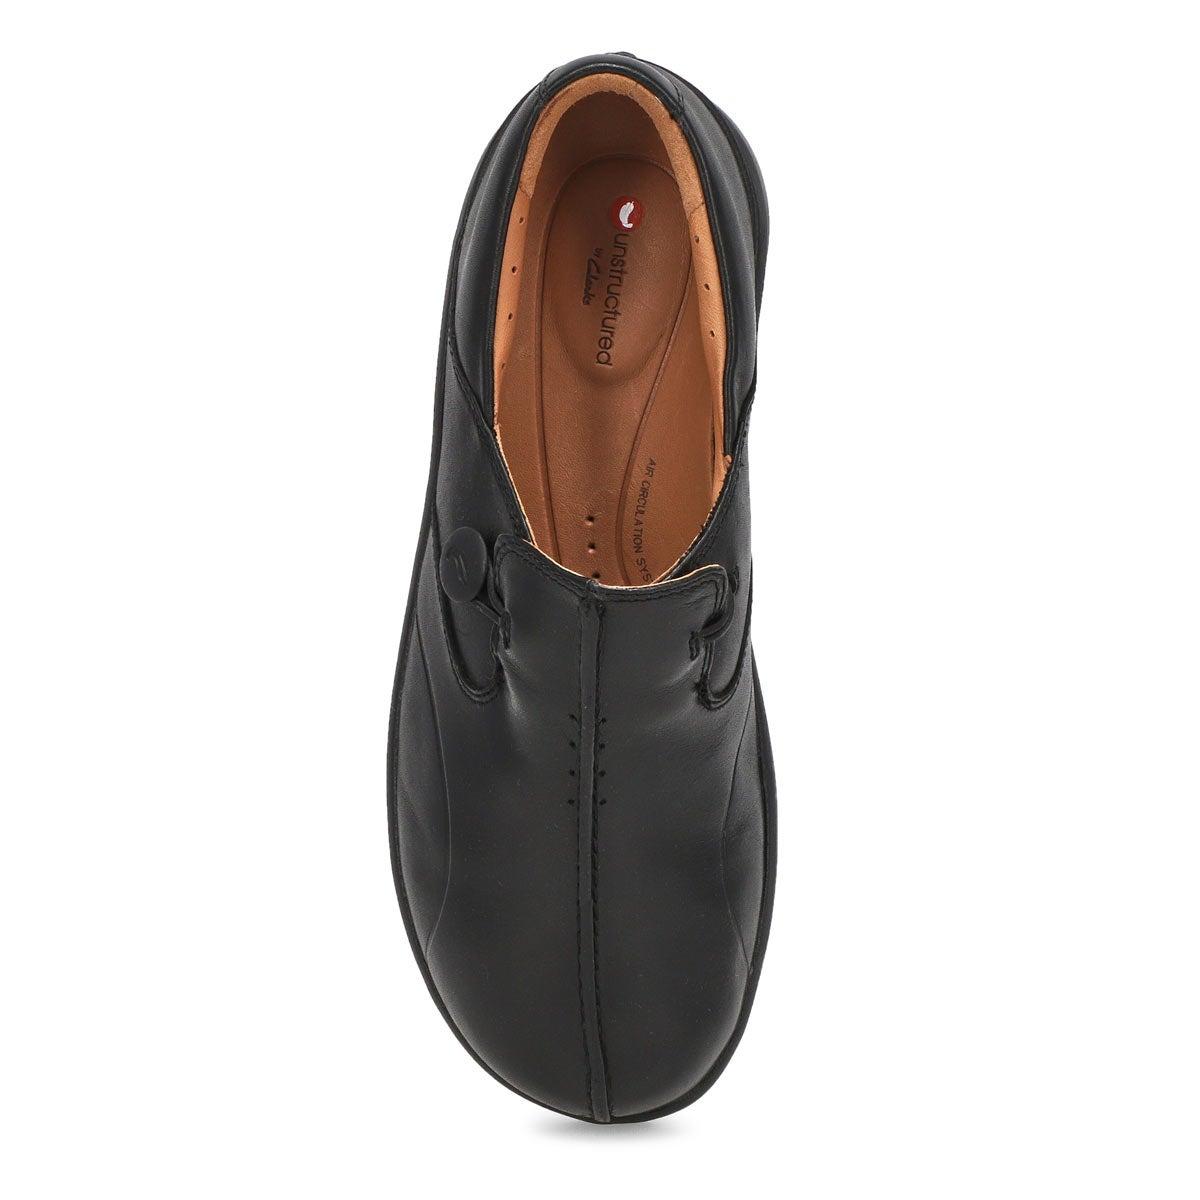 Women's Un Loop 2 Walk Casual Wide Shoe - Black